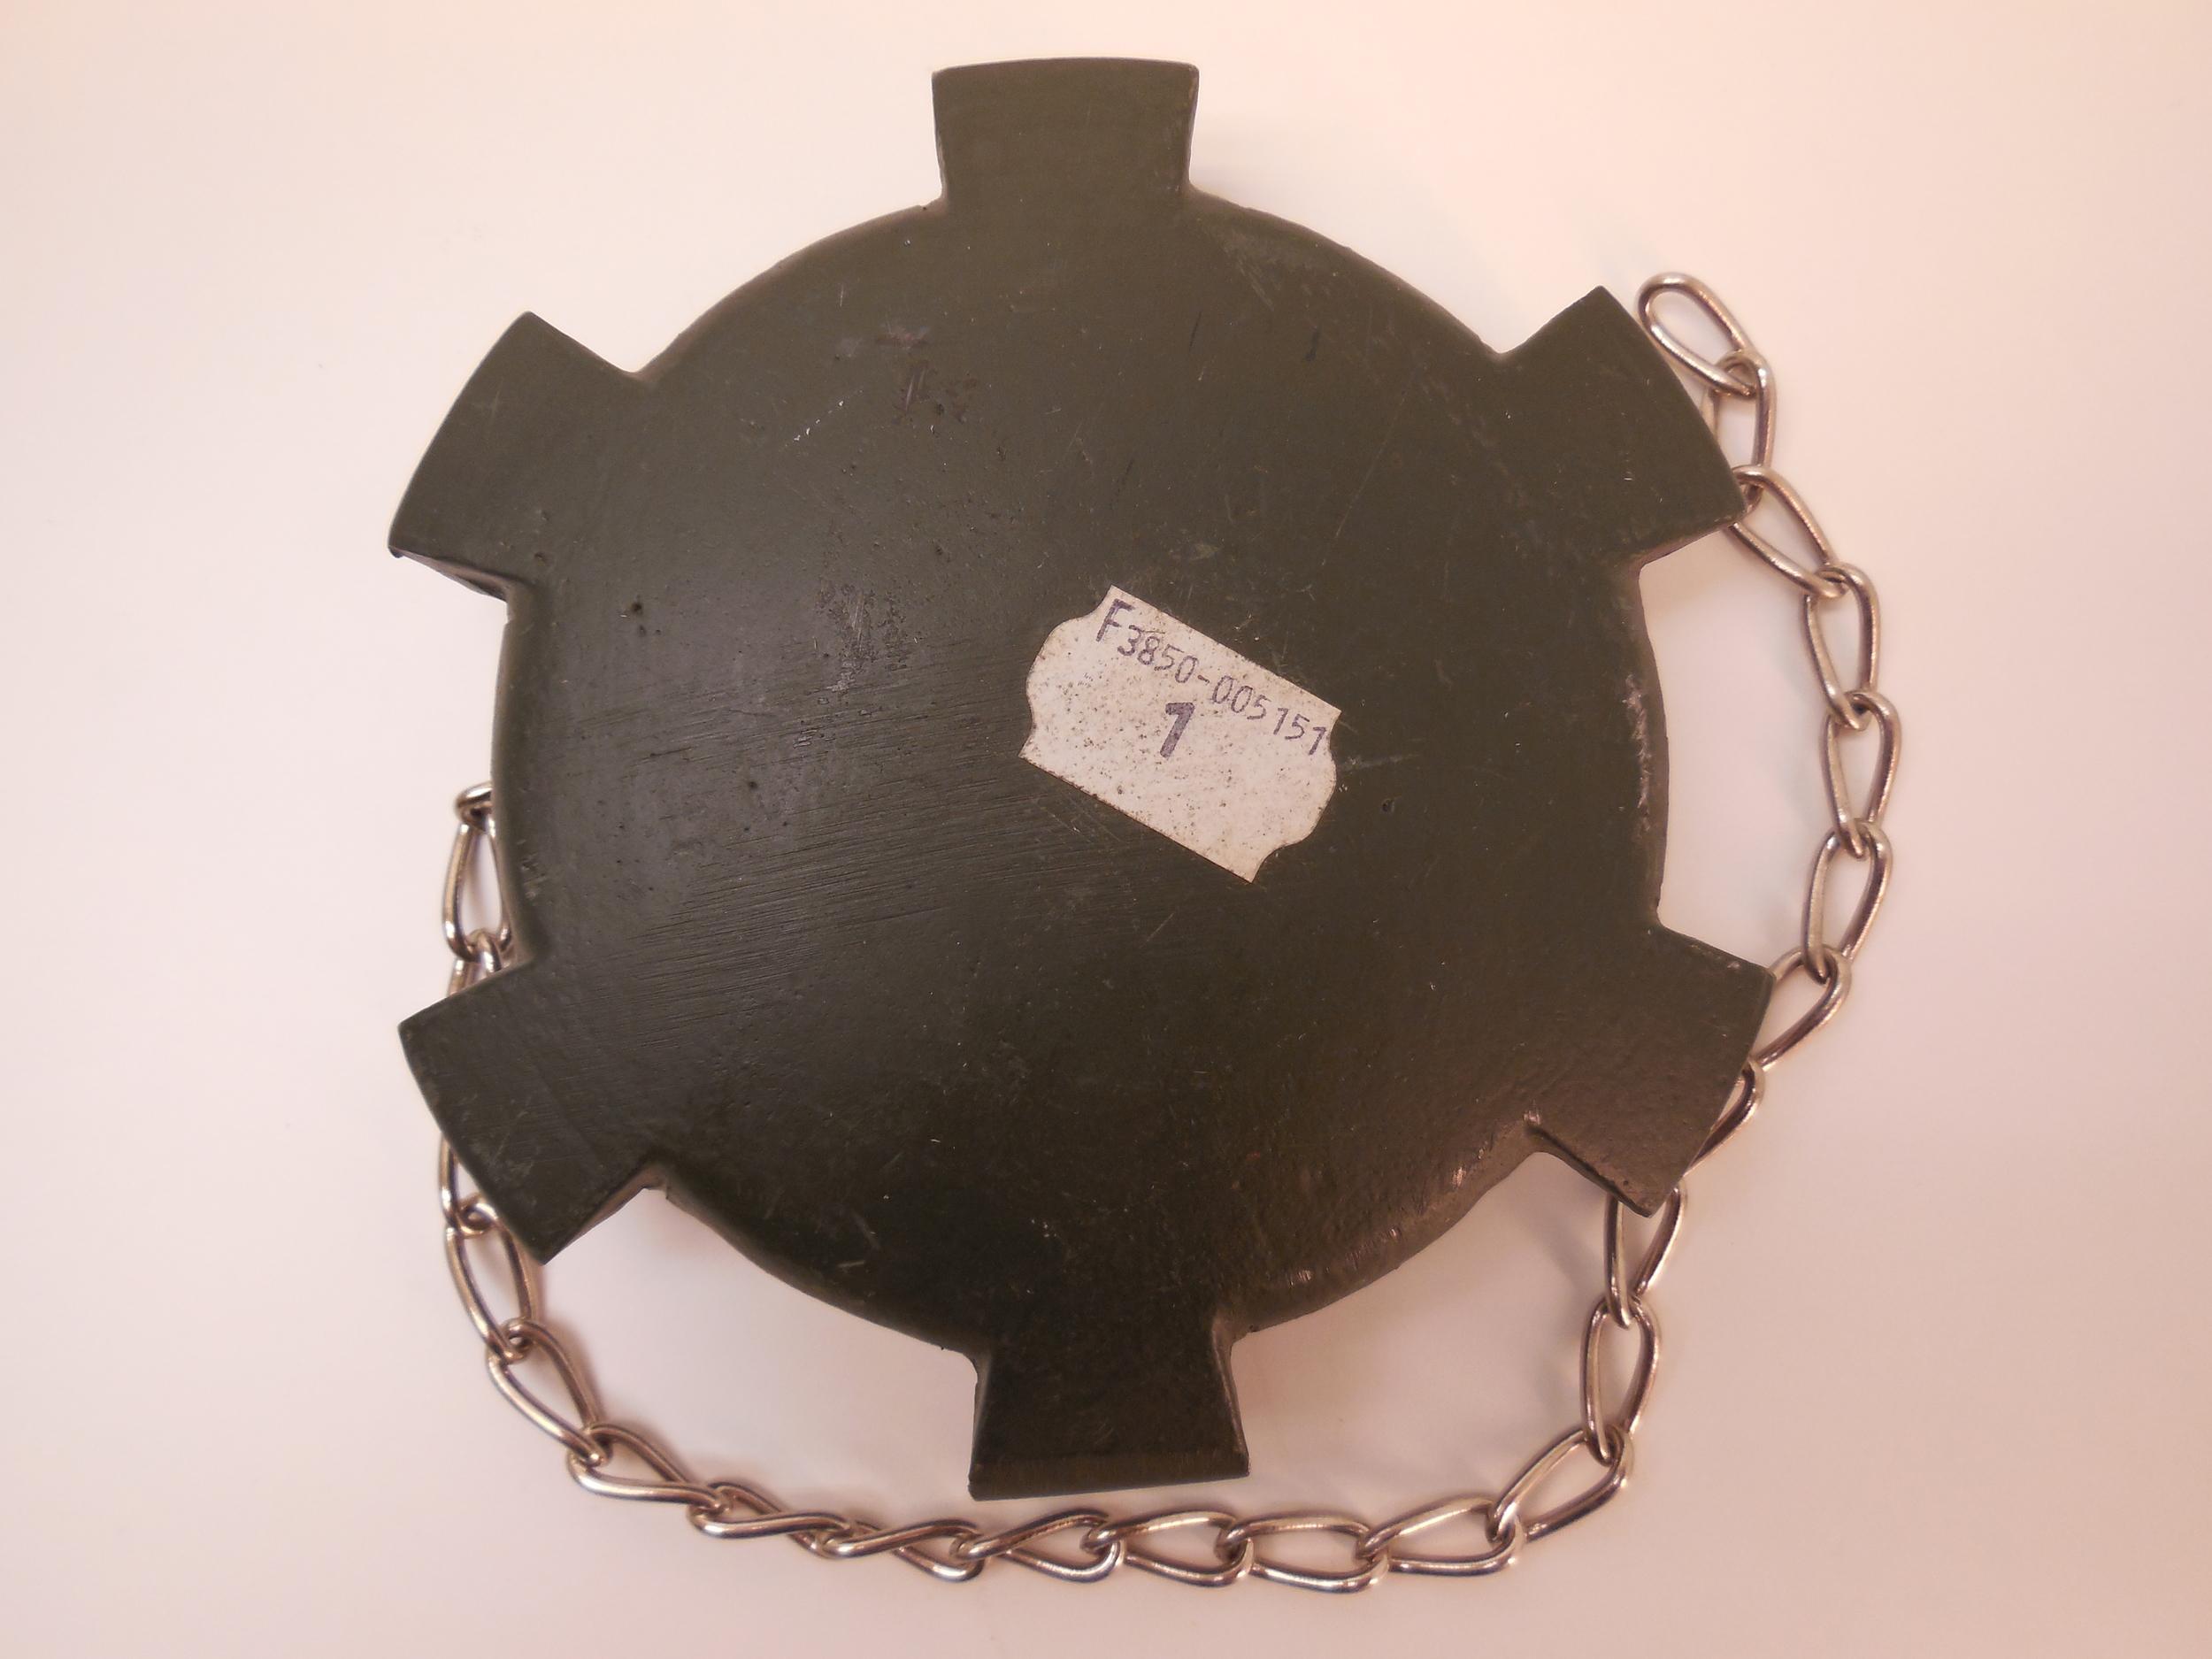 Gas Cap (Soft top) häggo Nr: 253 6285-001 price: 1100 SEK